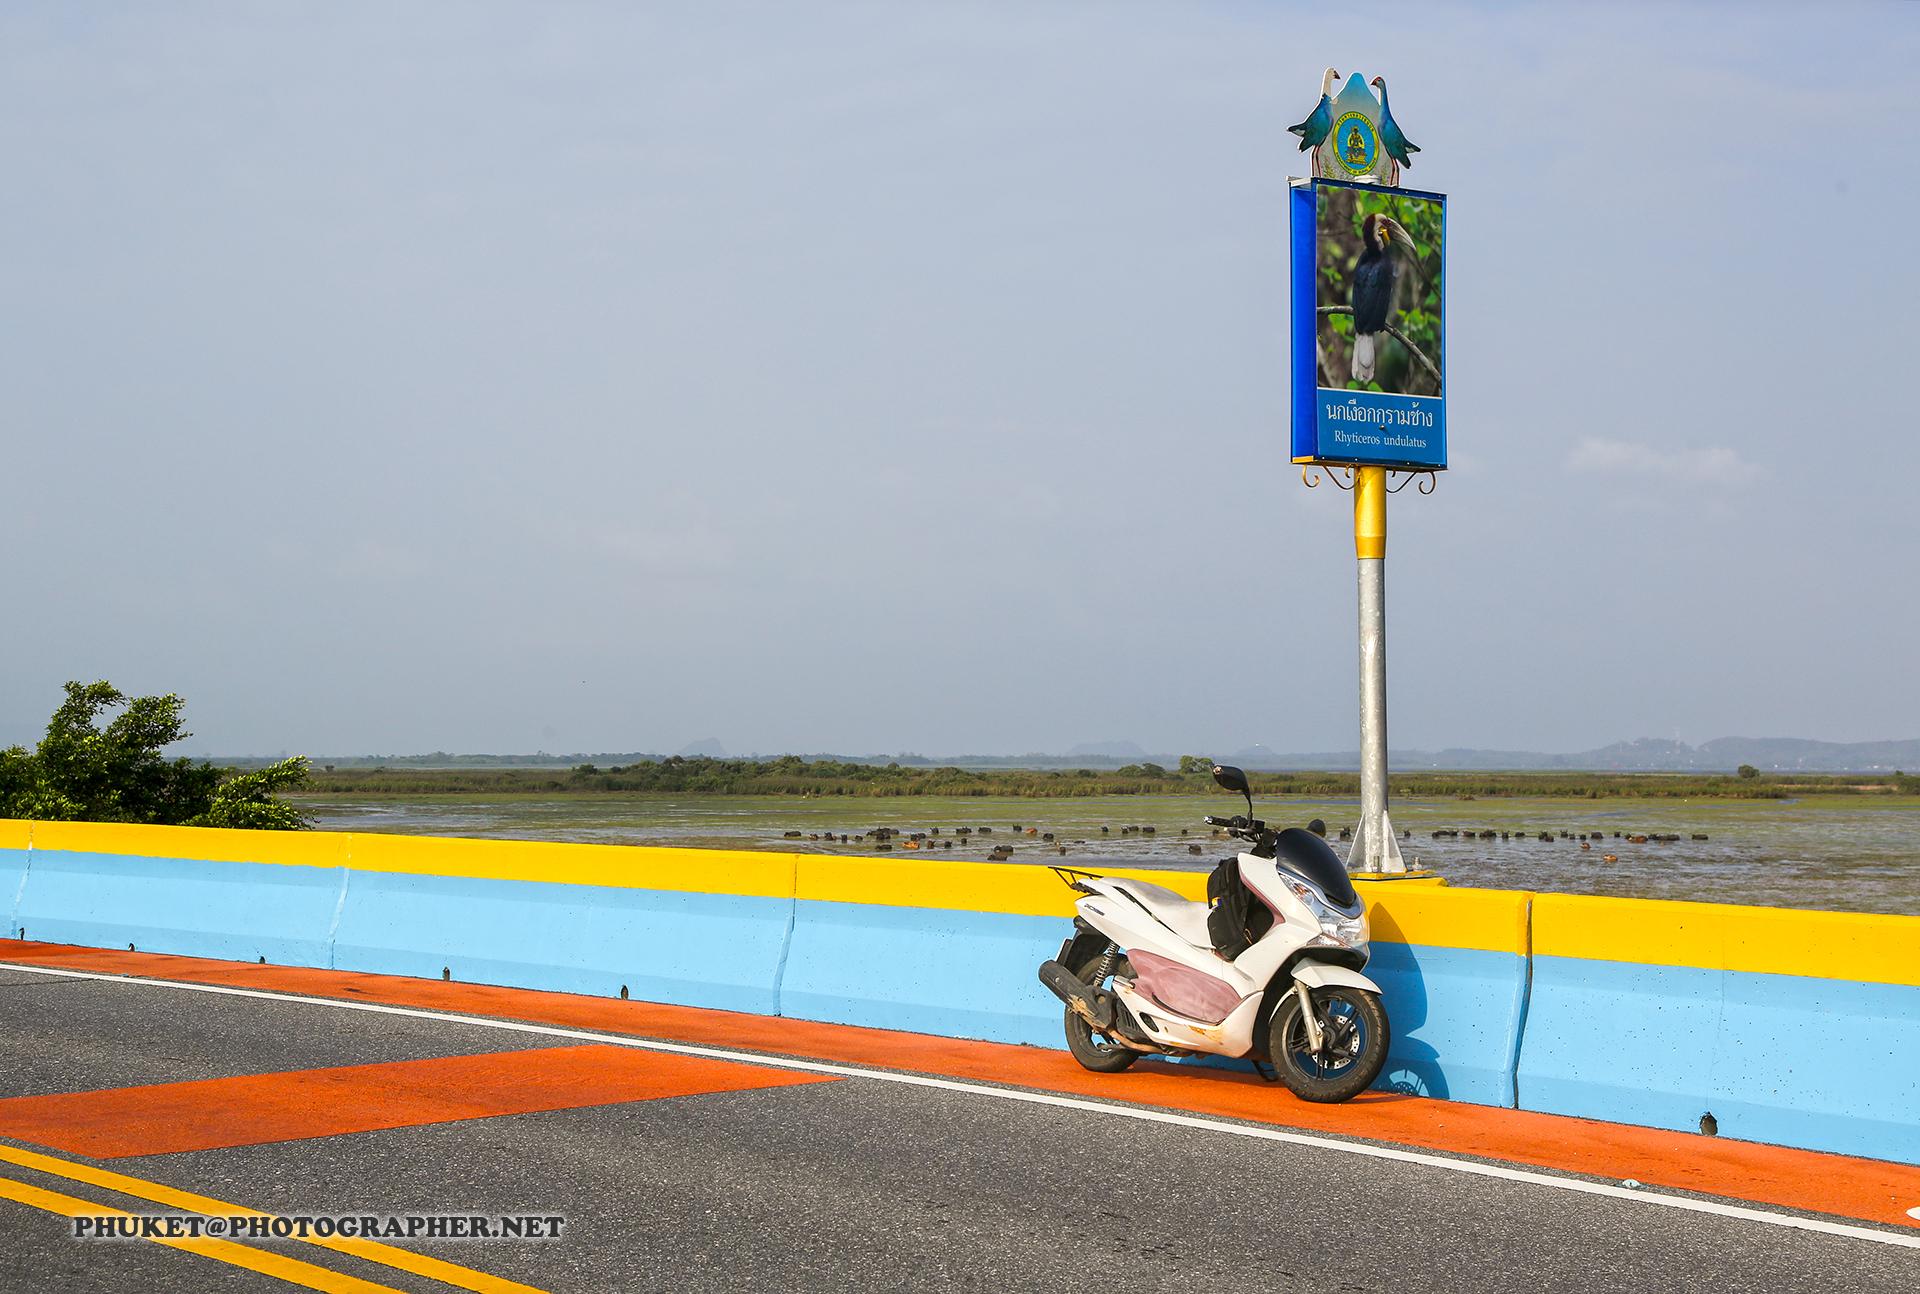 Wallpaper Boat Sea Garden Lake Water Grass Hat Motorcycle Vehicle Road Coffee Wind Island Honda Tea Malaysia Cactus Drive Racing